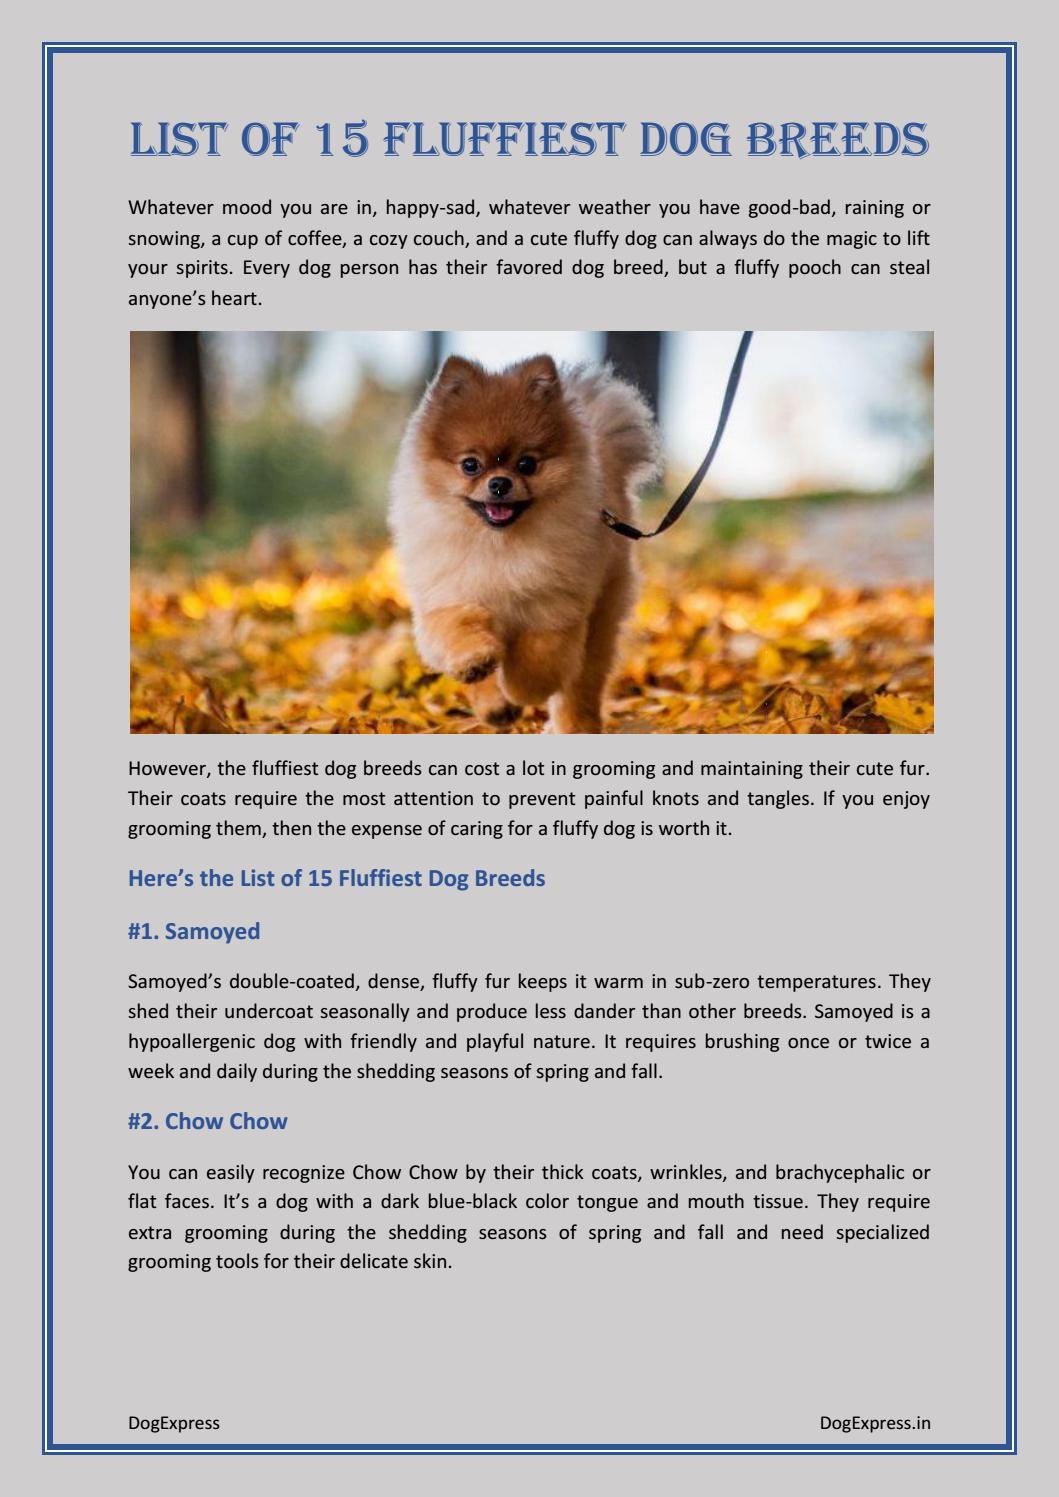 List of 15 Fluffiest Dog Breeds